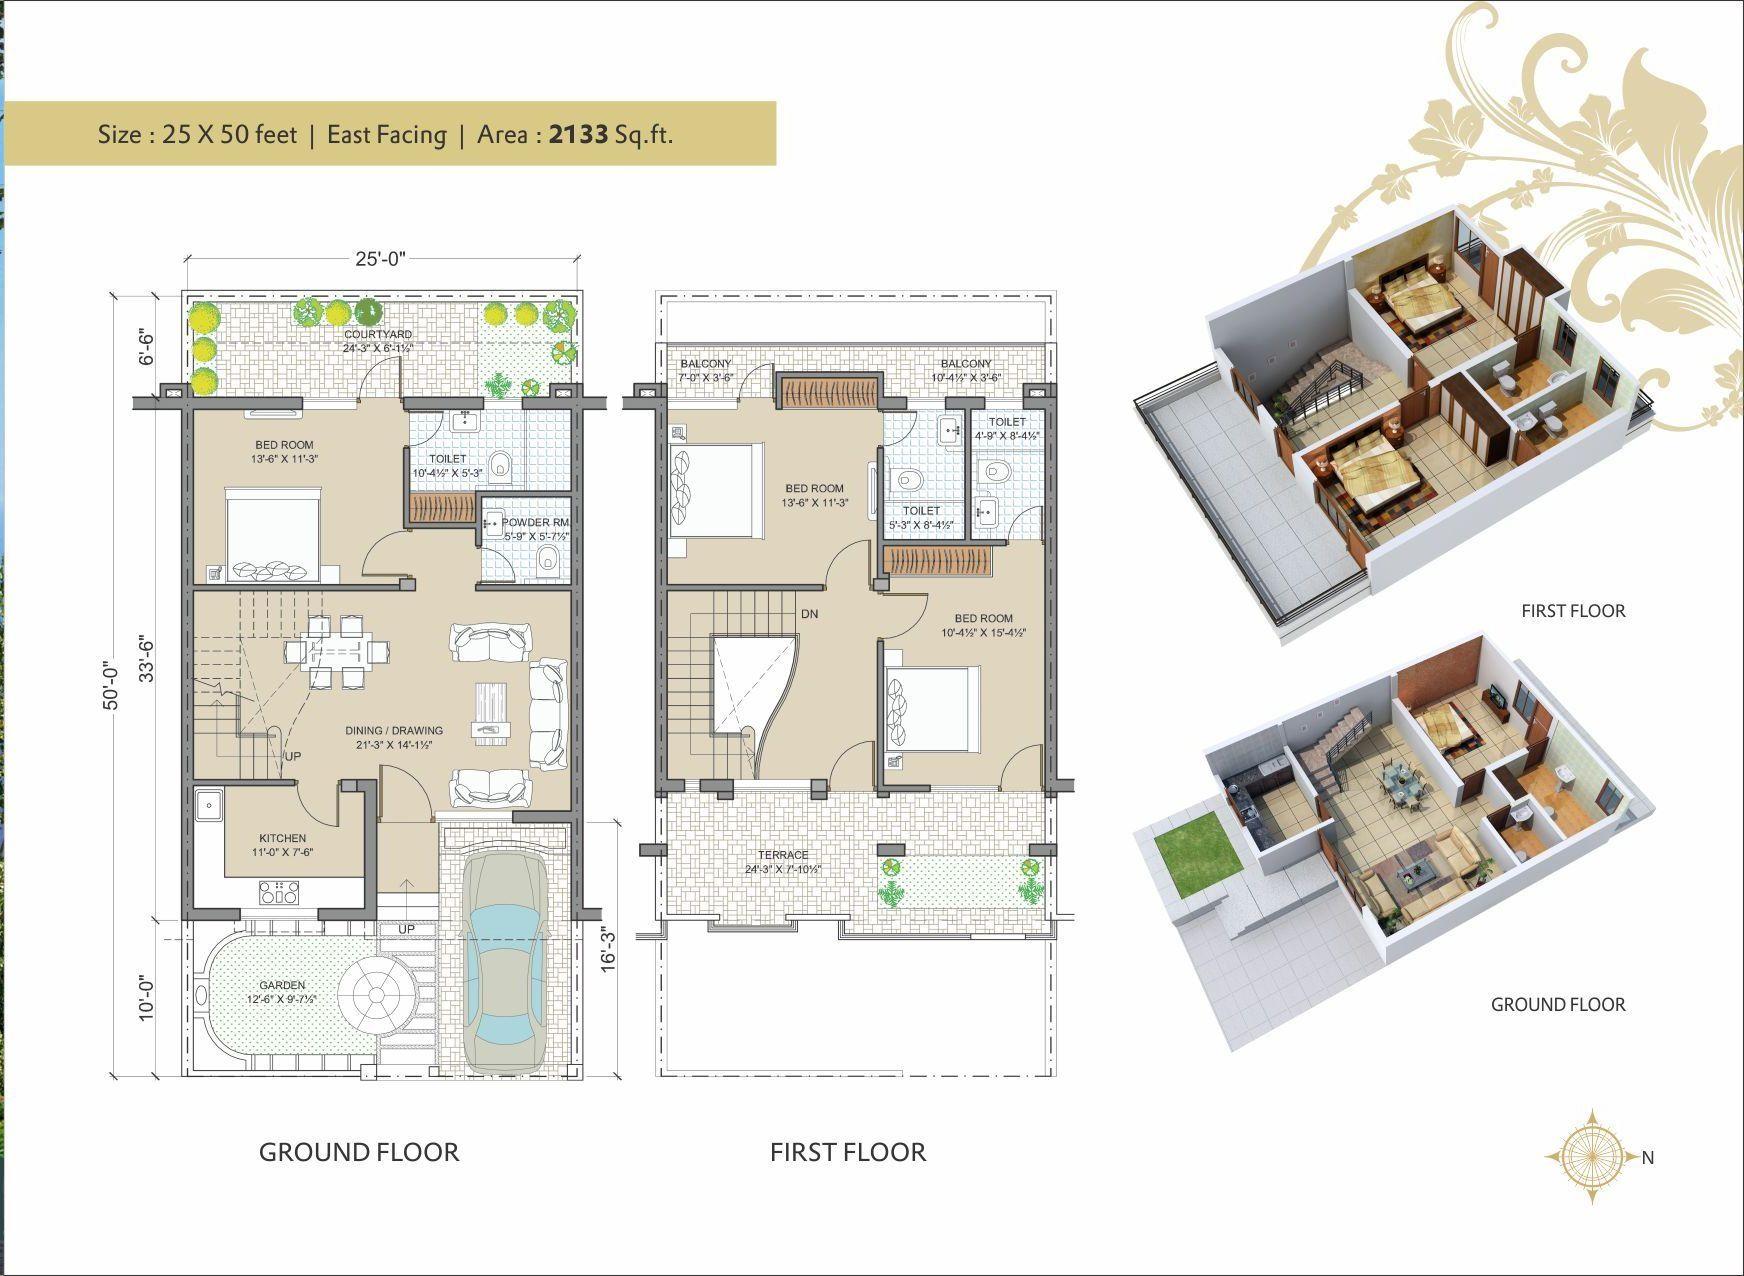 2 Bedroom House Plans 3d Fresh 3d Floor Plans 3d Home Design Free 3d Models Islaminjapanmedia In 2020 Living Room Wood Floor Bedroom House Plans Trendy Living Rooms